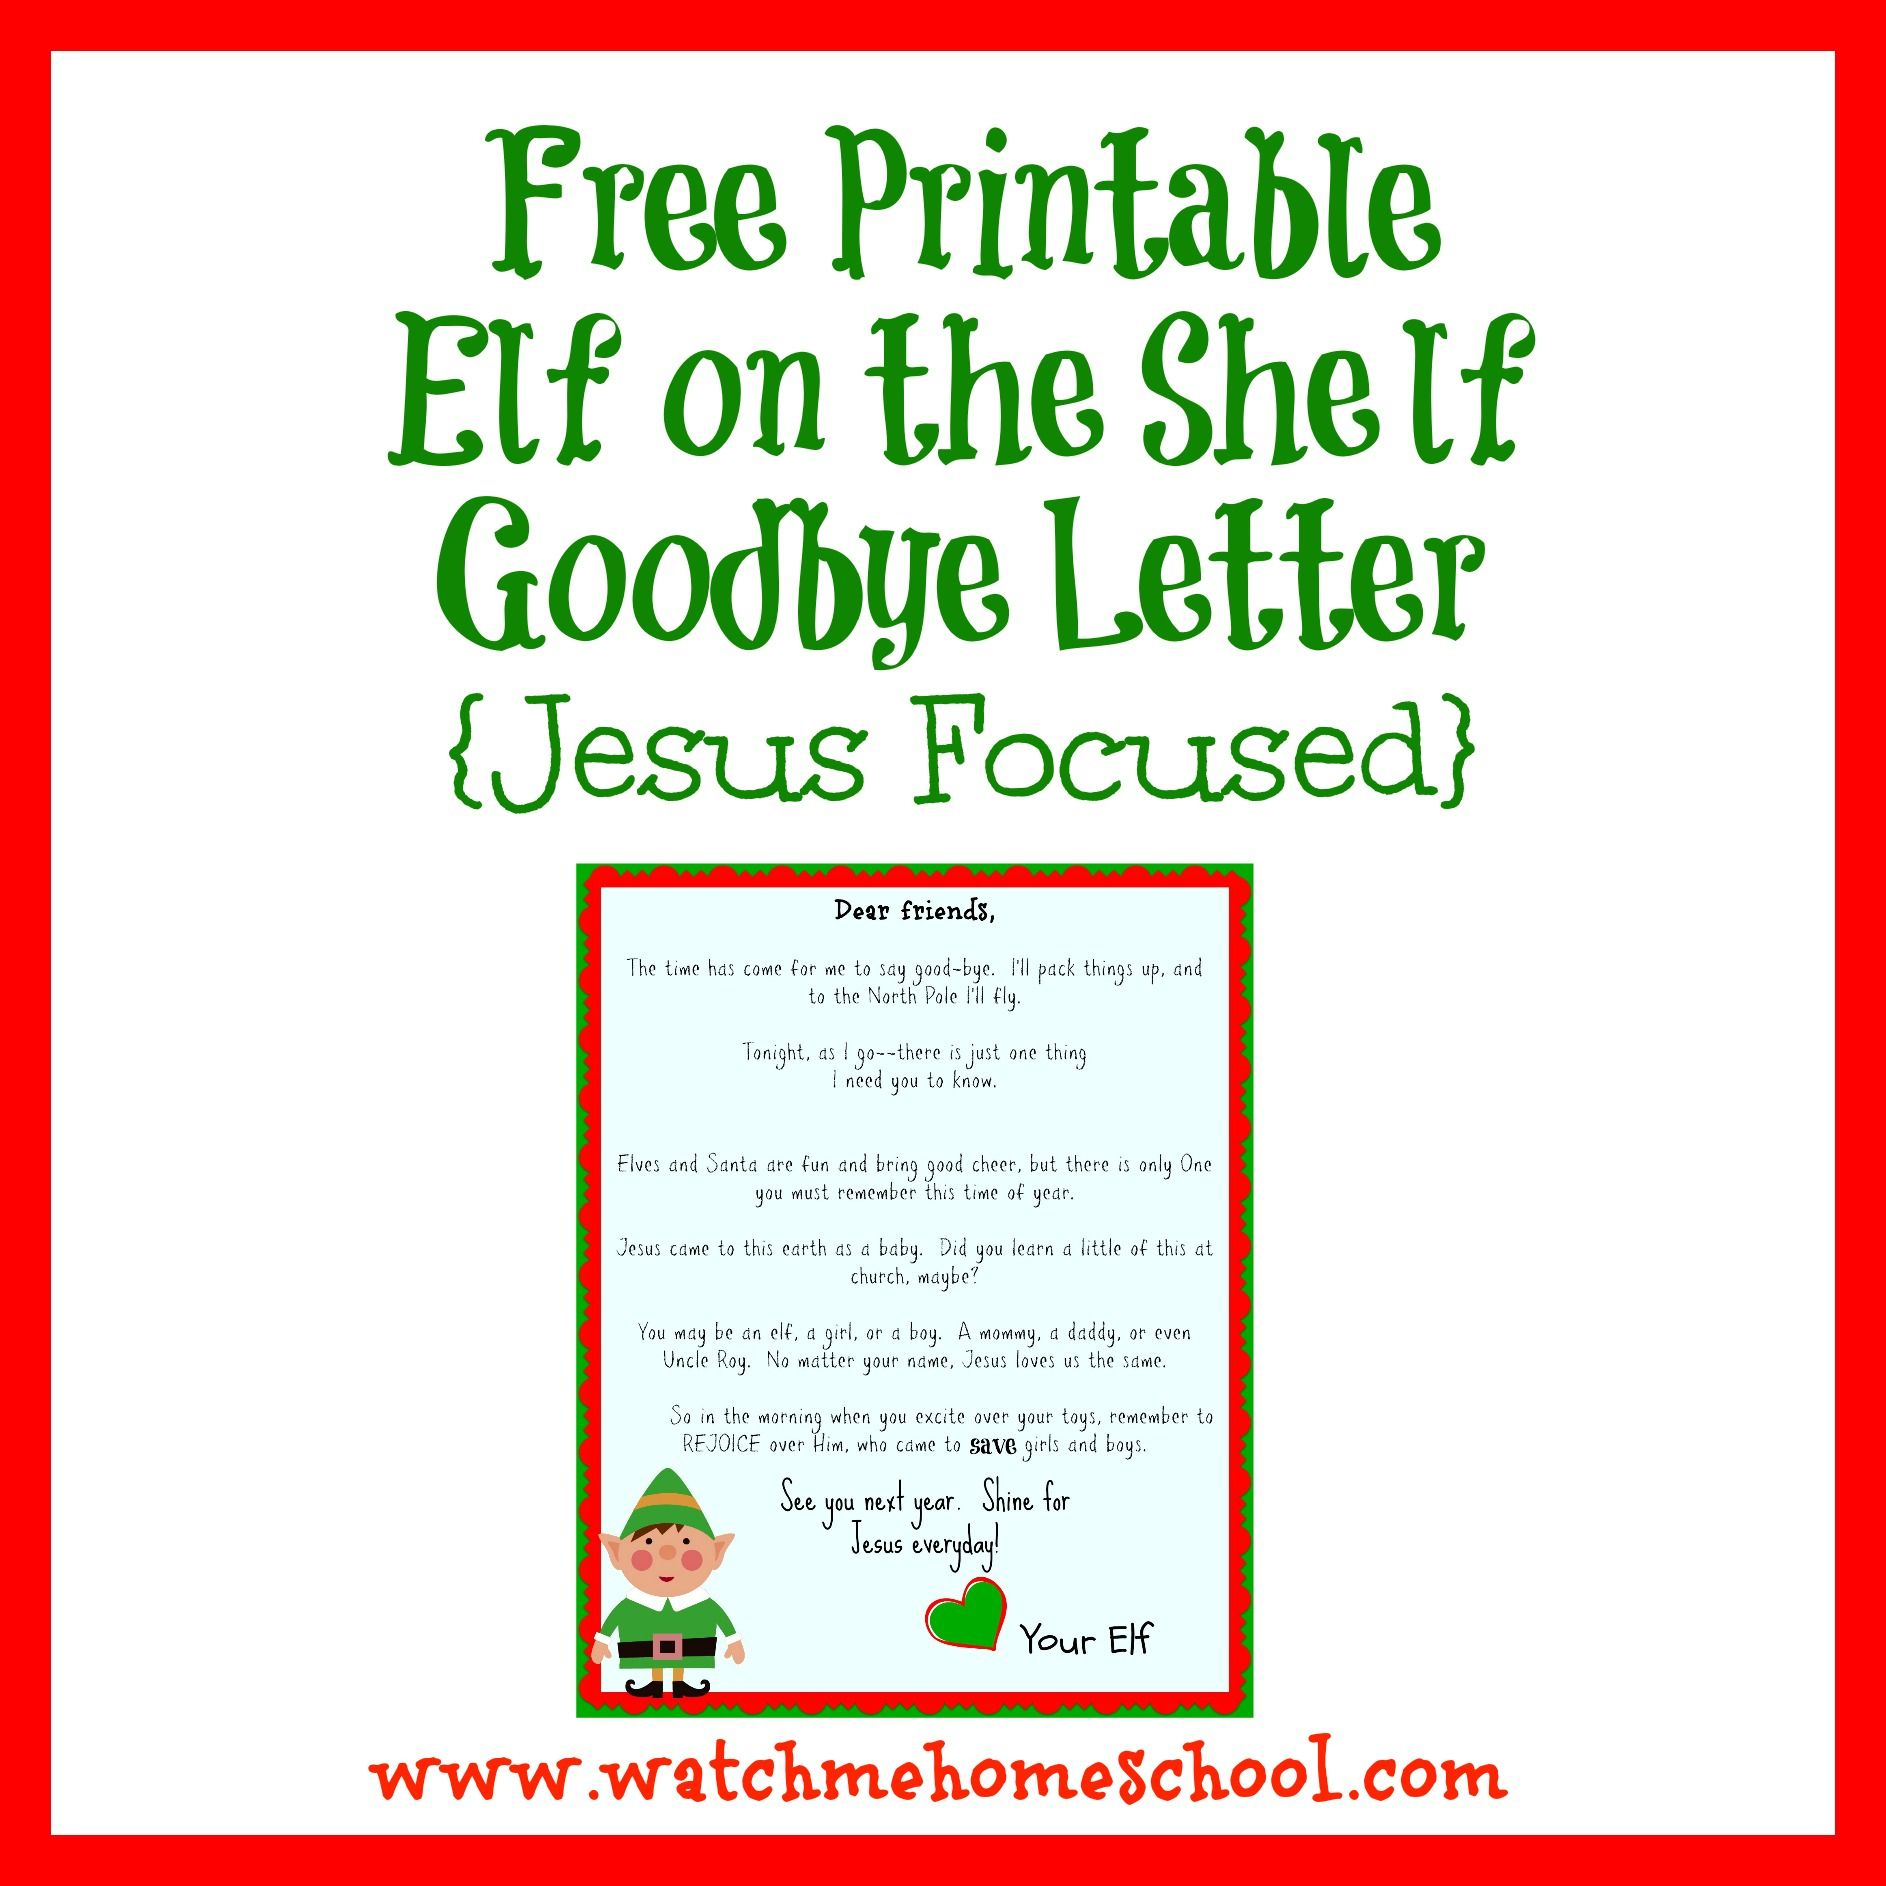 Elf On The Shelf Farewell Letter Printable   Elf On The Shelf - Elf On A Shelf Goodbye Letter Free Printable